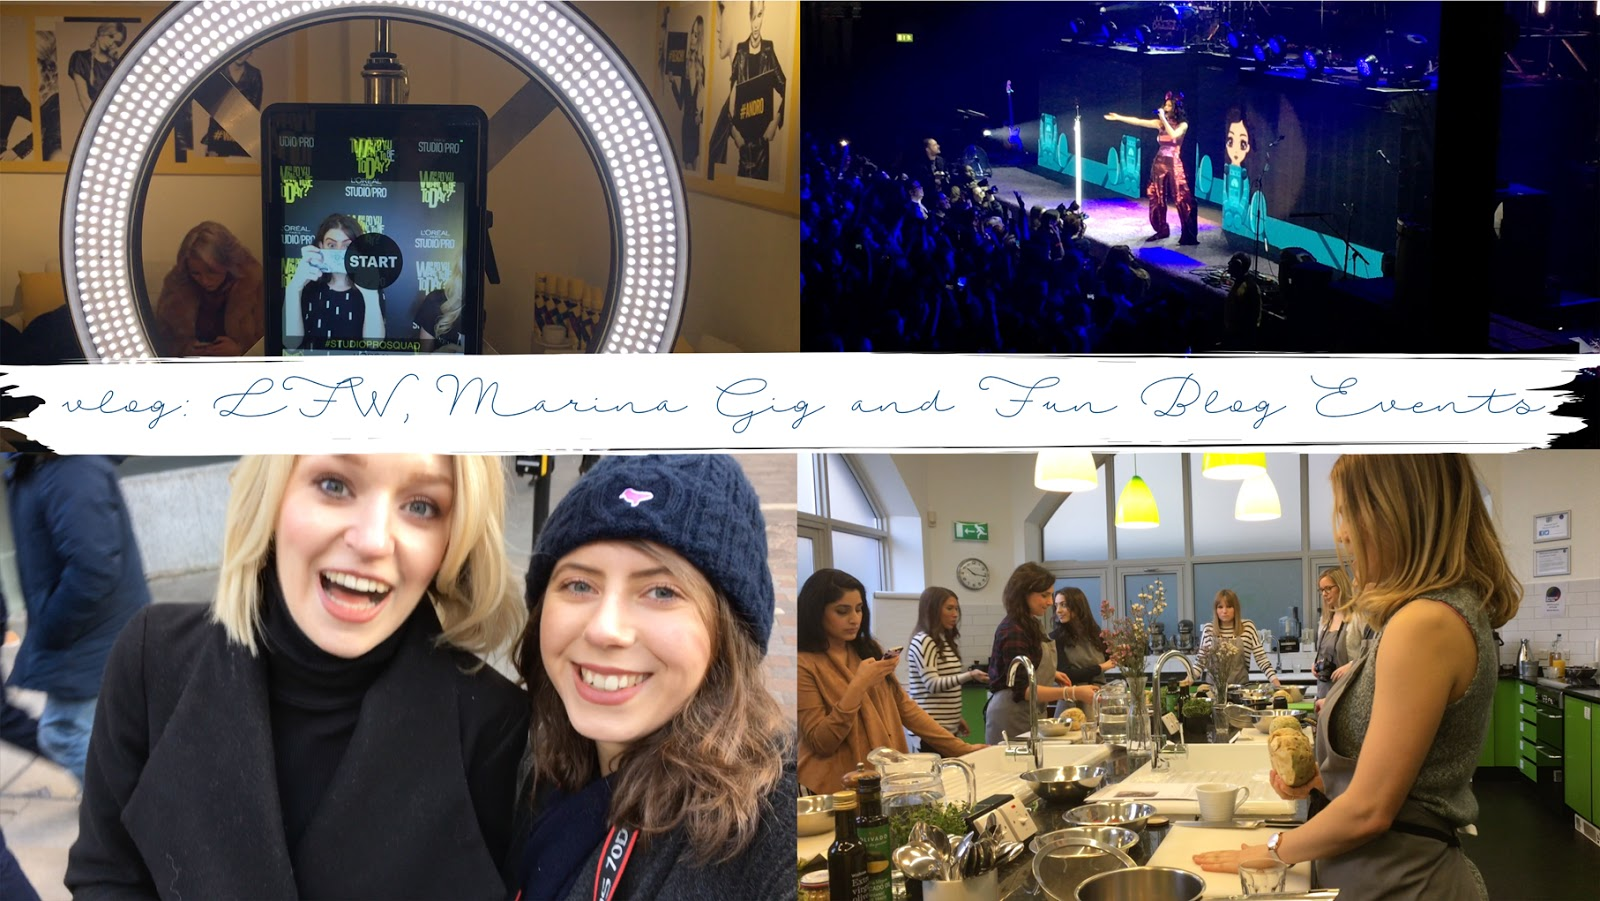 LFW, MARINA & THE DIAMONDS + BLOG EVENTS